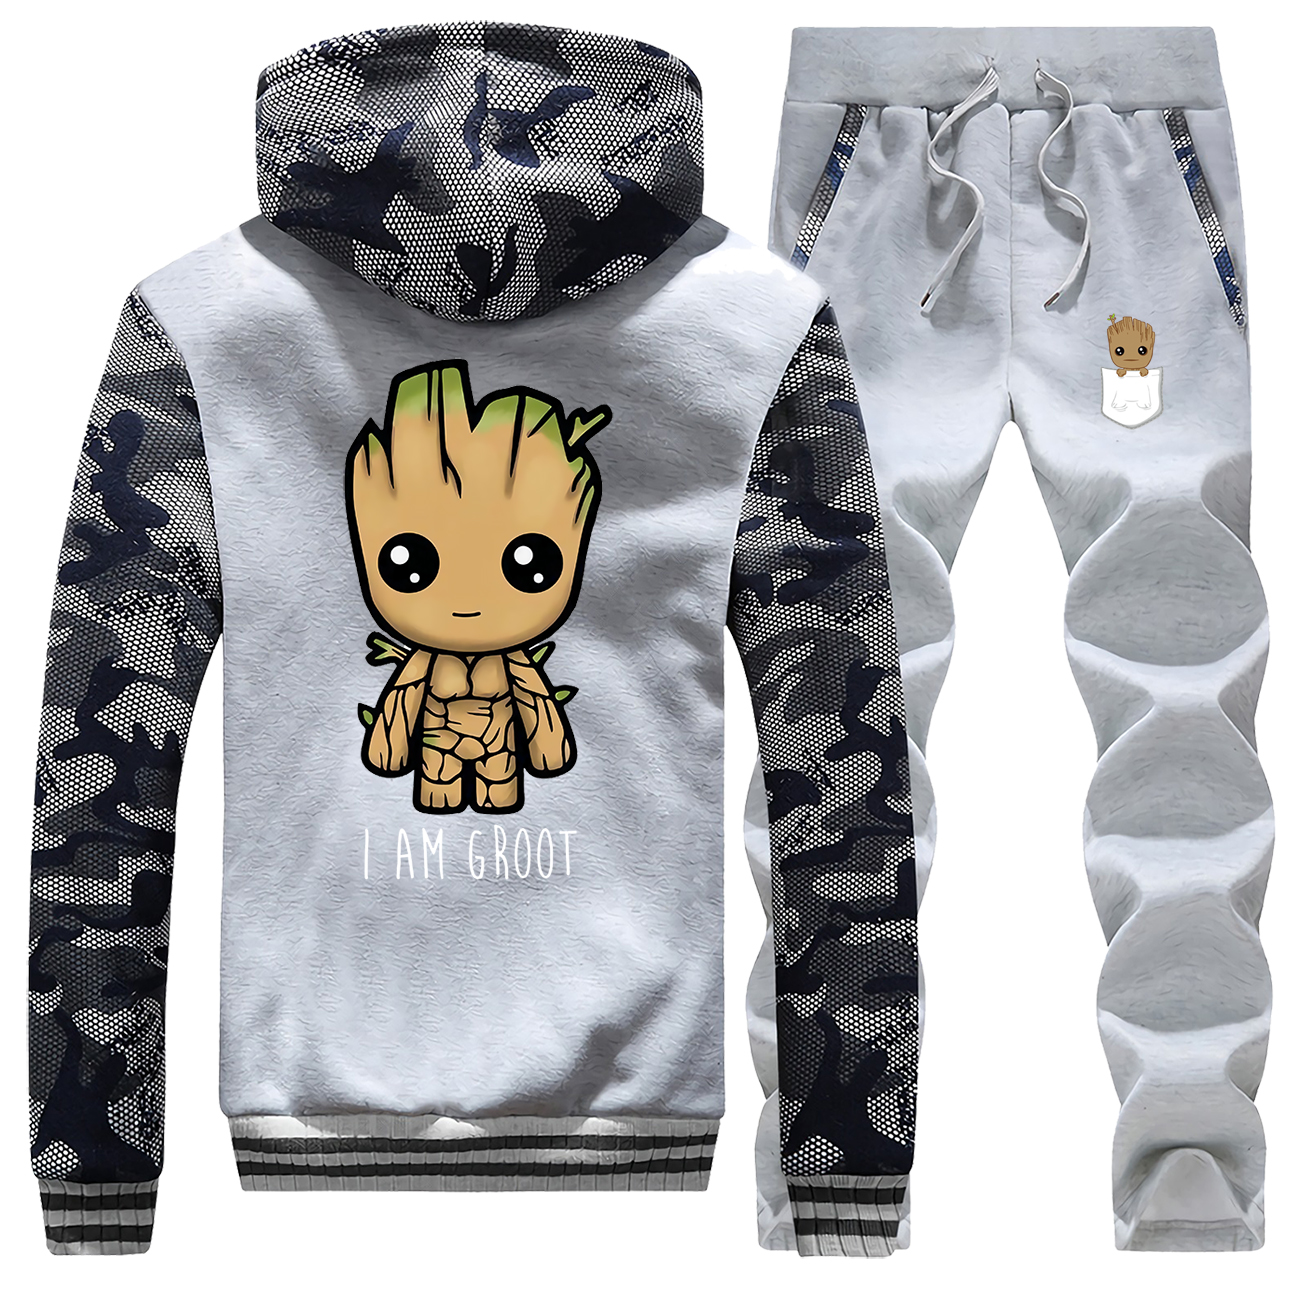 Hot Sale Winter Guardians Of The Galaxy Cartoon Cute Groot Camouflage Sportswear Fashion Hoodie Warm Jacket+Pants 2 Piece Set